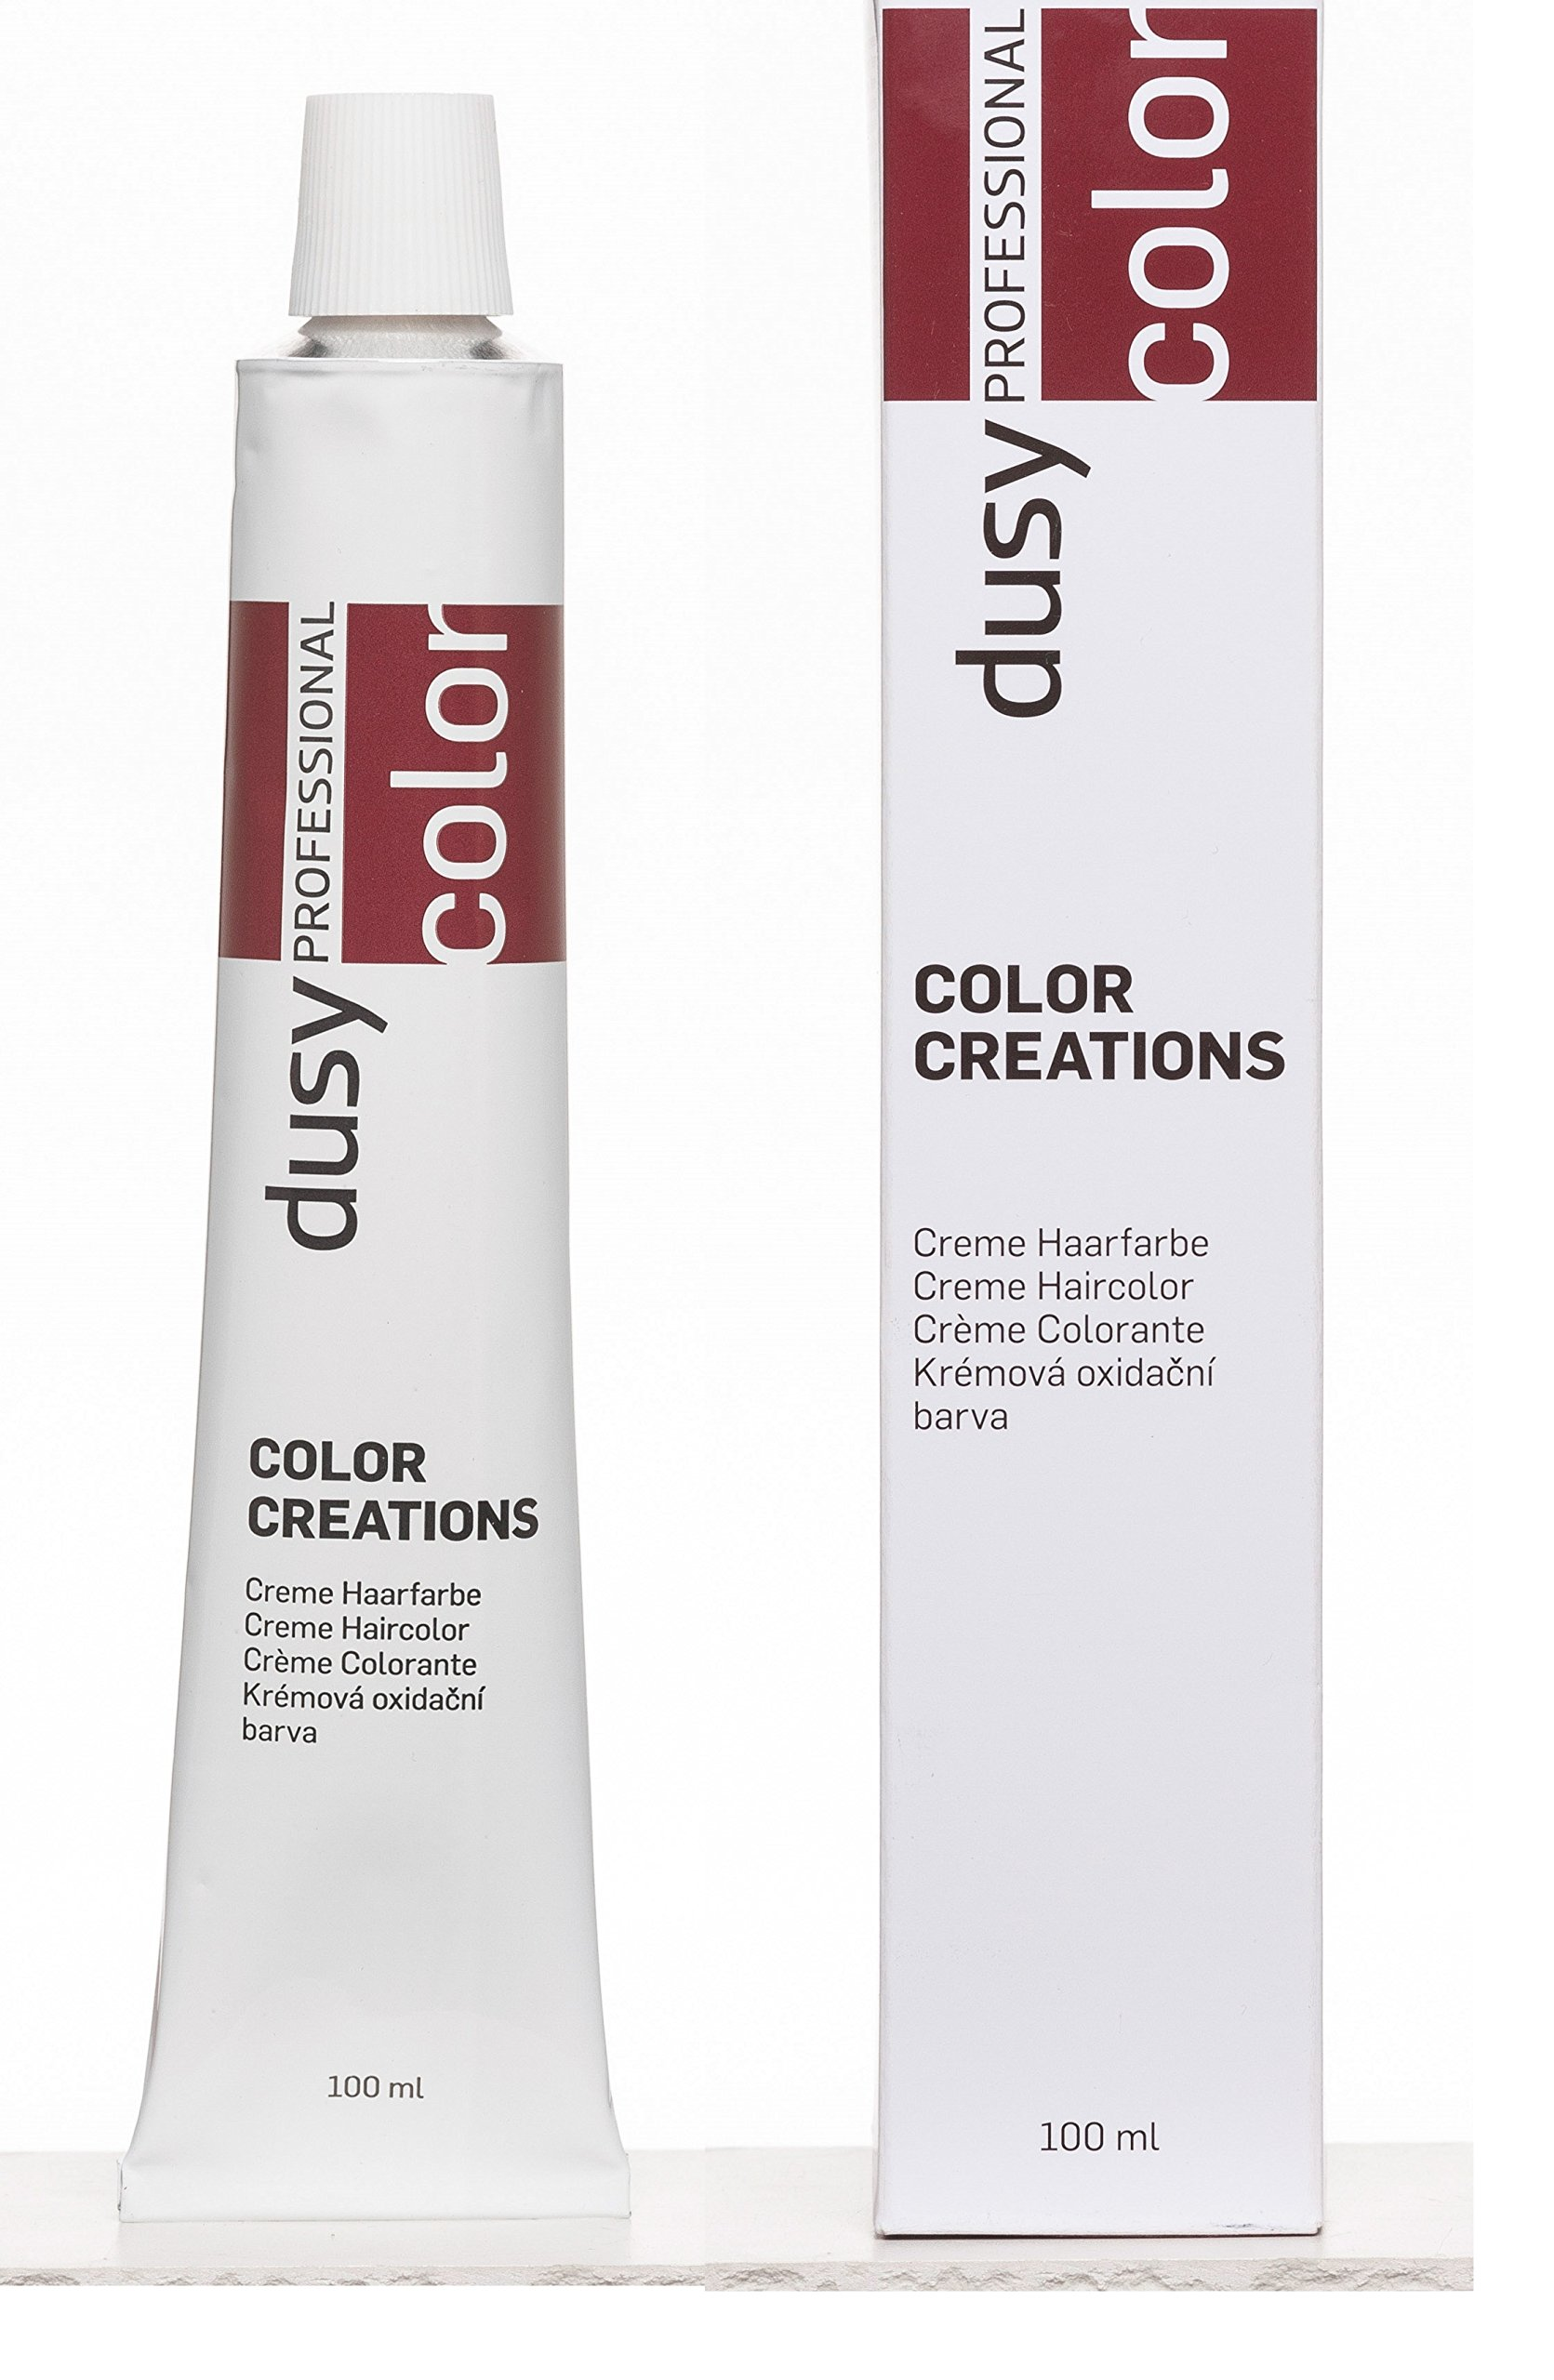 Dusy professional color Creations Intensive Reds 66.46�capelli biondo scuro intenso rosso���viola 1